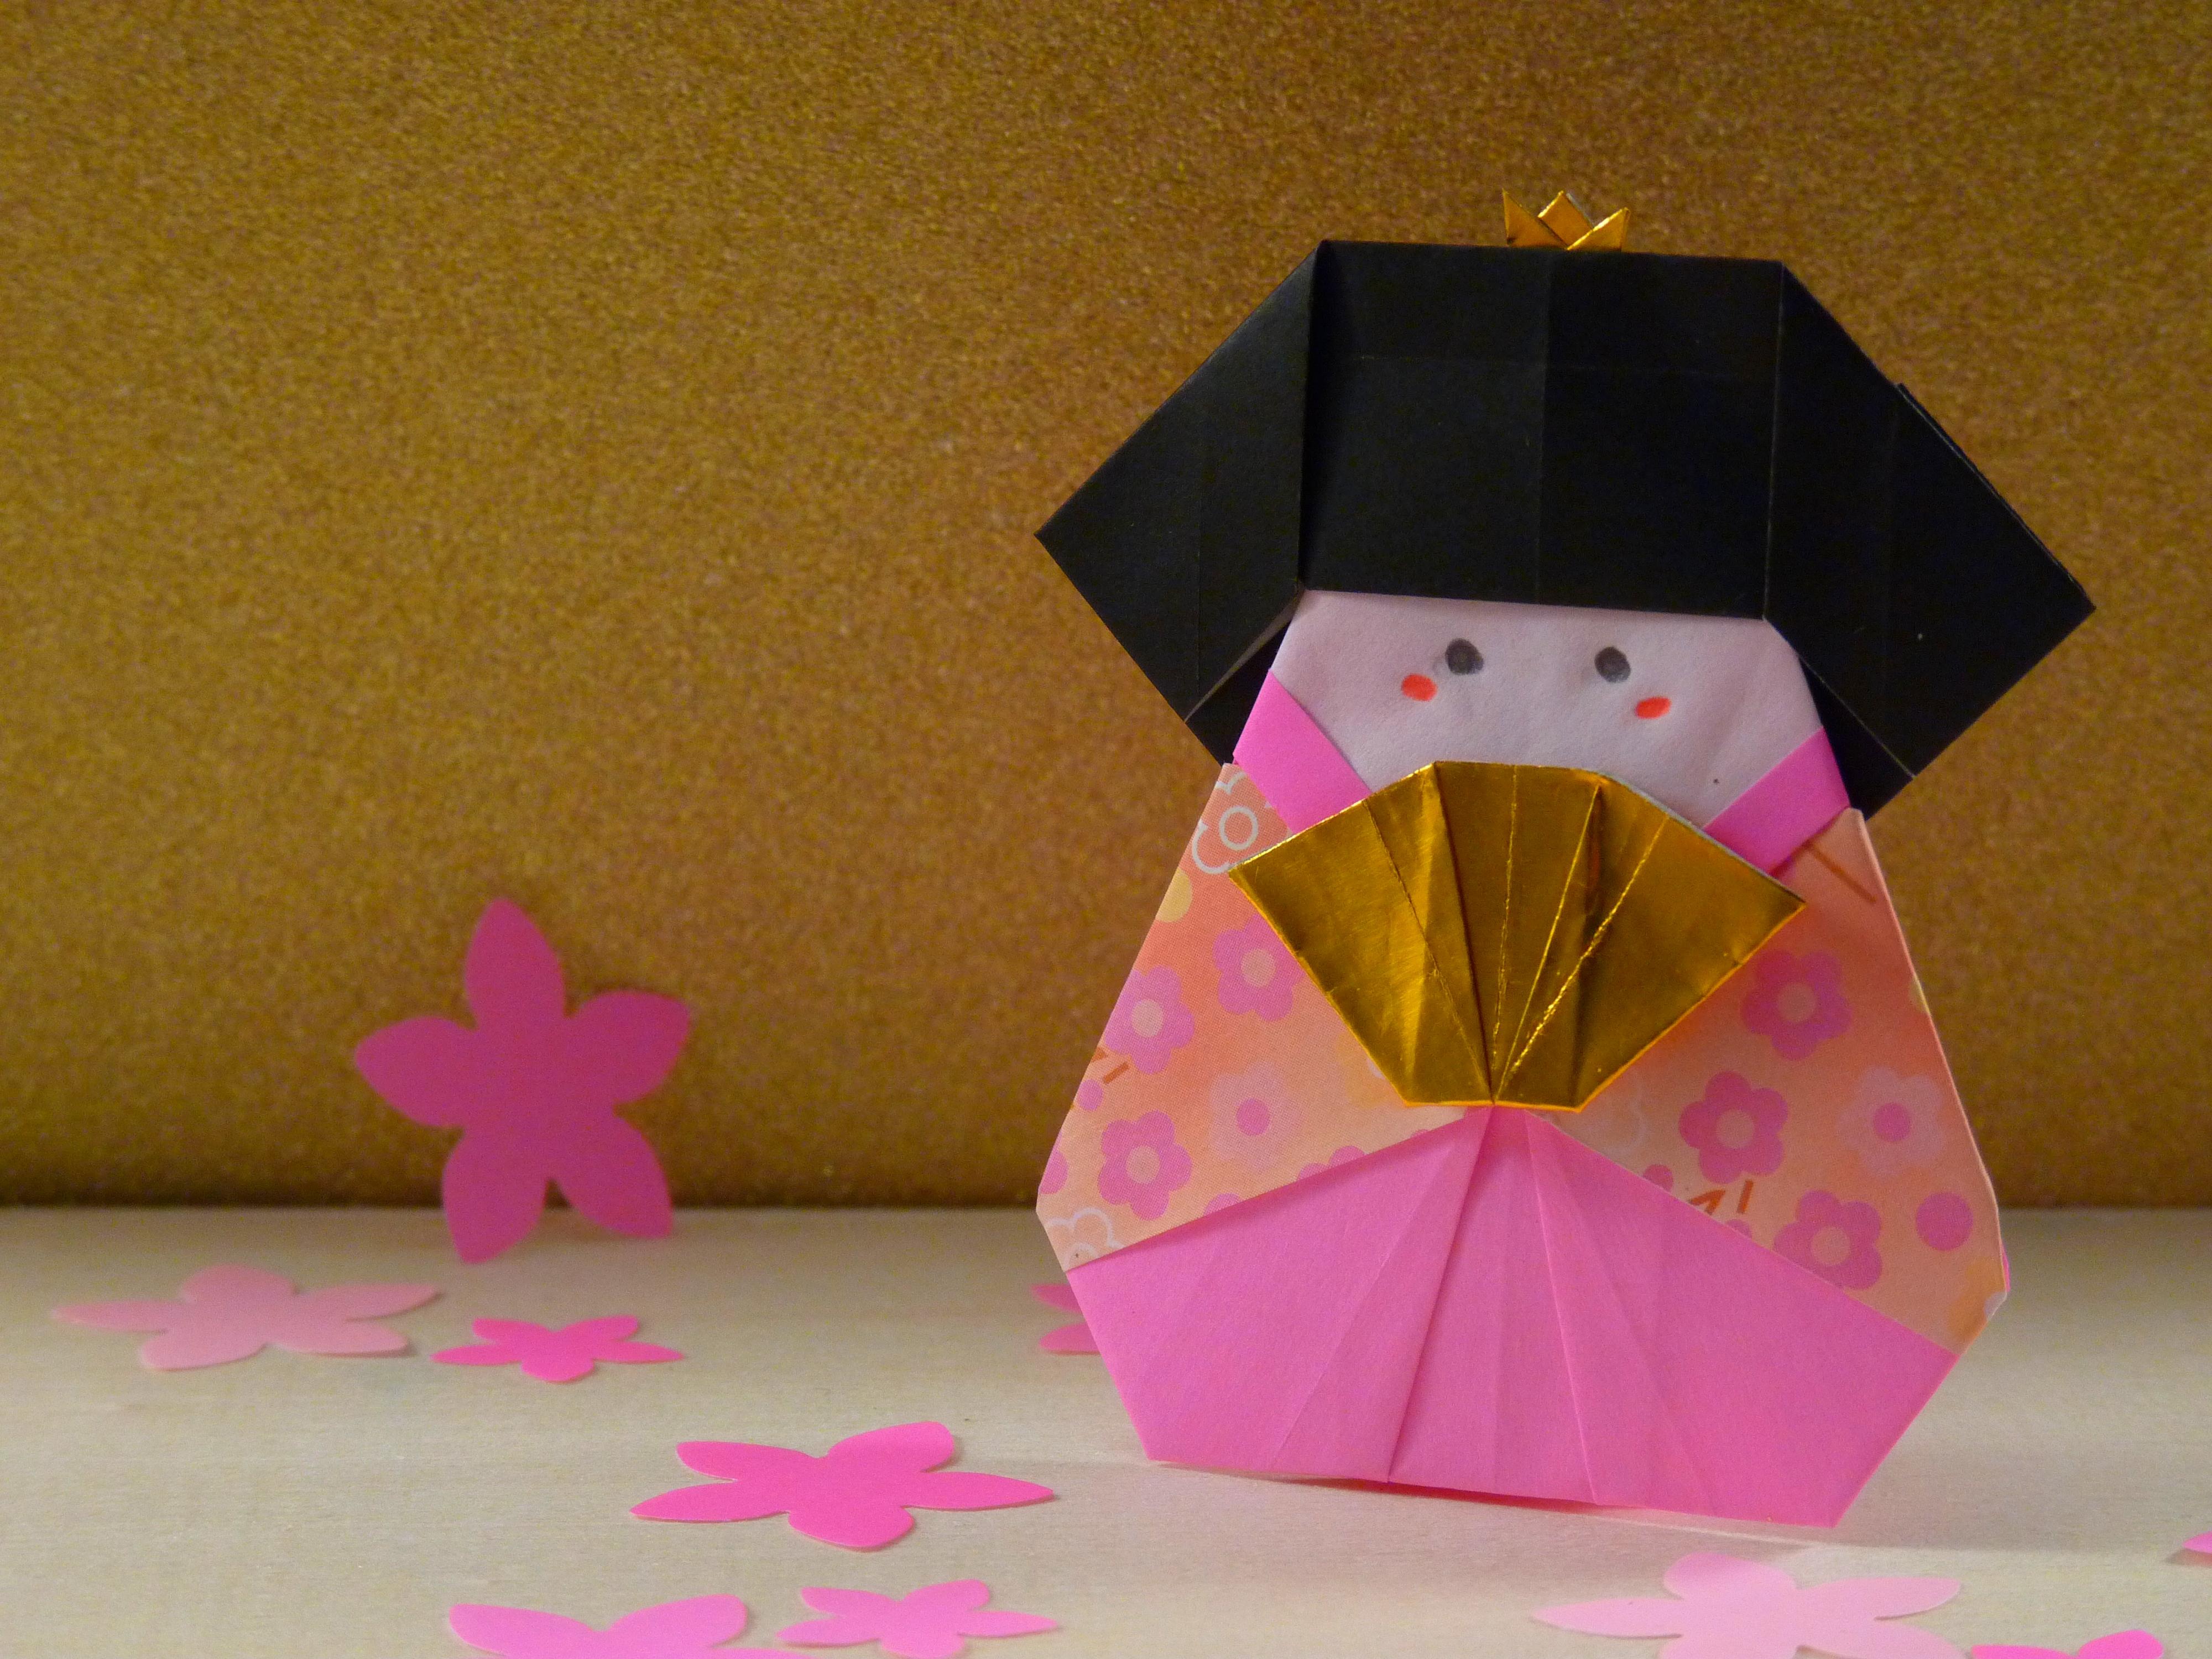 Stand_poupées_en_origami_hina_matsuri_-_